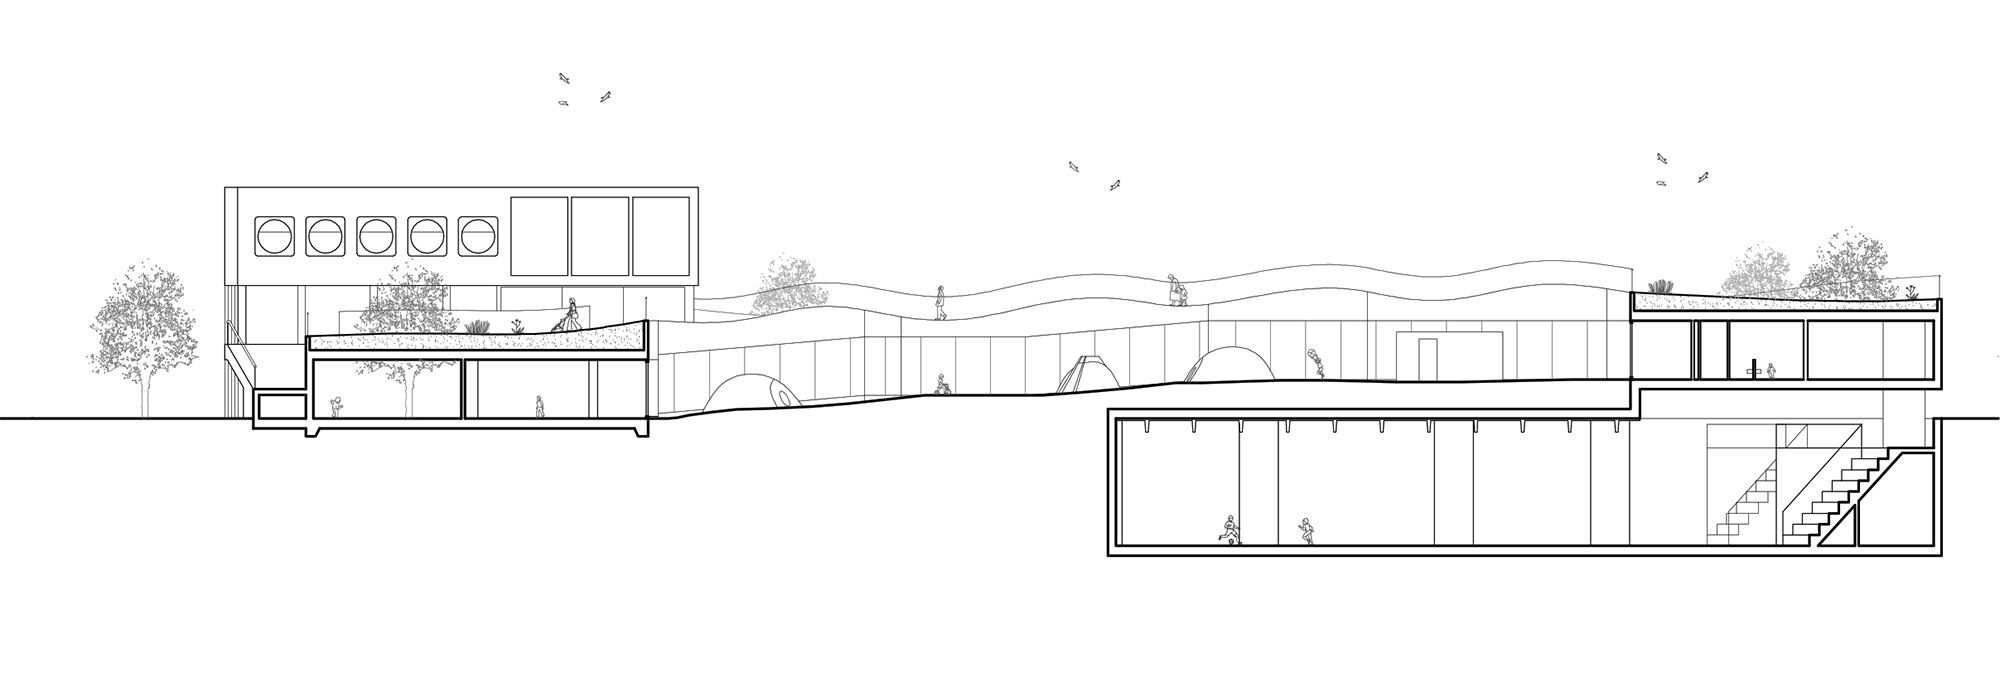 Architektur_offizin-a_gatto.weber.architekten_Projekte_Kultur_HiBaloo_06.jpg